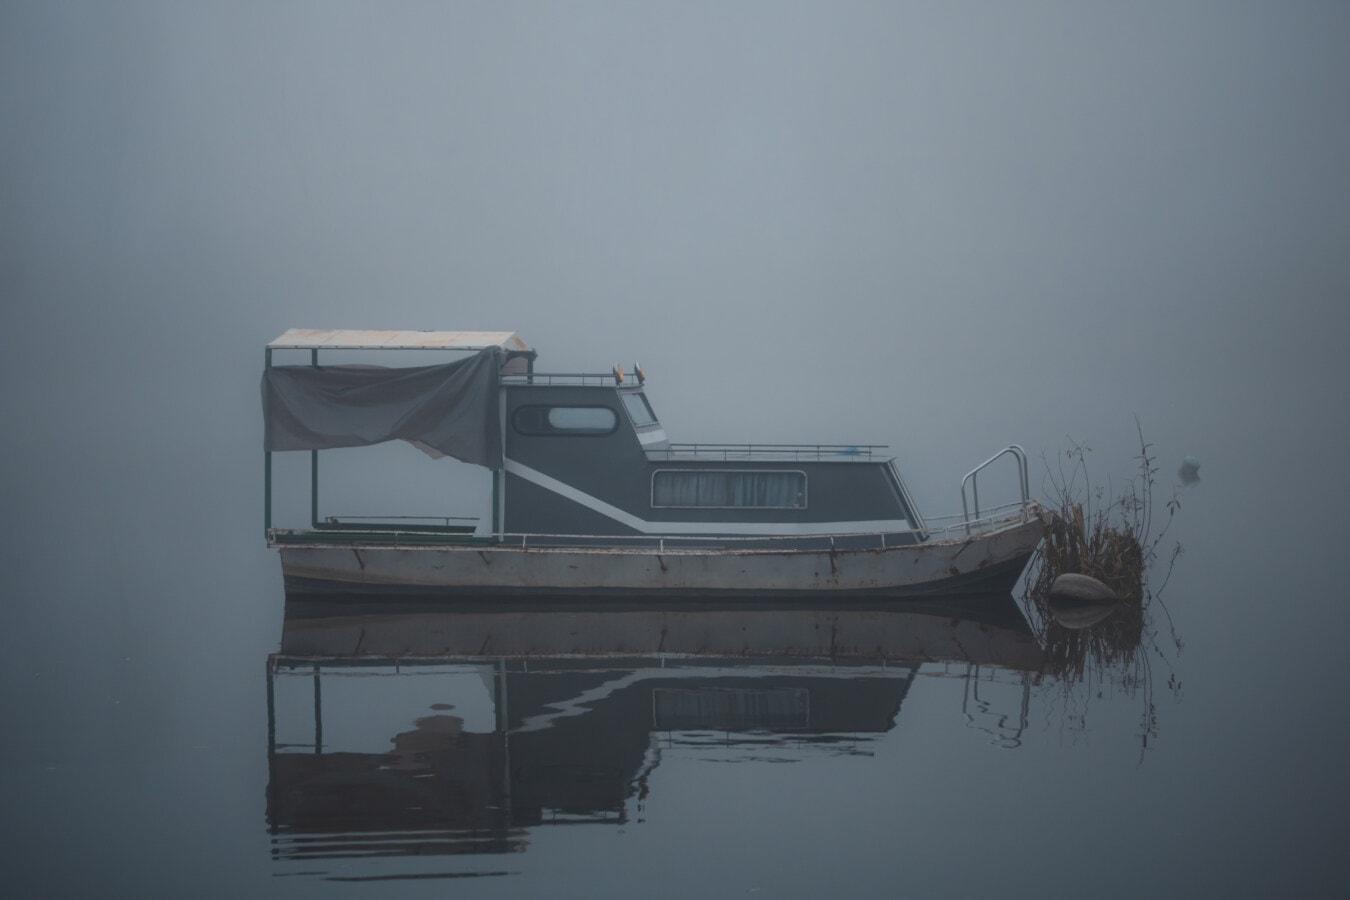 Boot, Nebel, neblig, Angelboot/Fischerboot, Wasser, Dämmerung, Nebel, Strand, See, Fluss